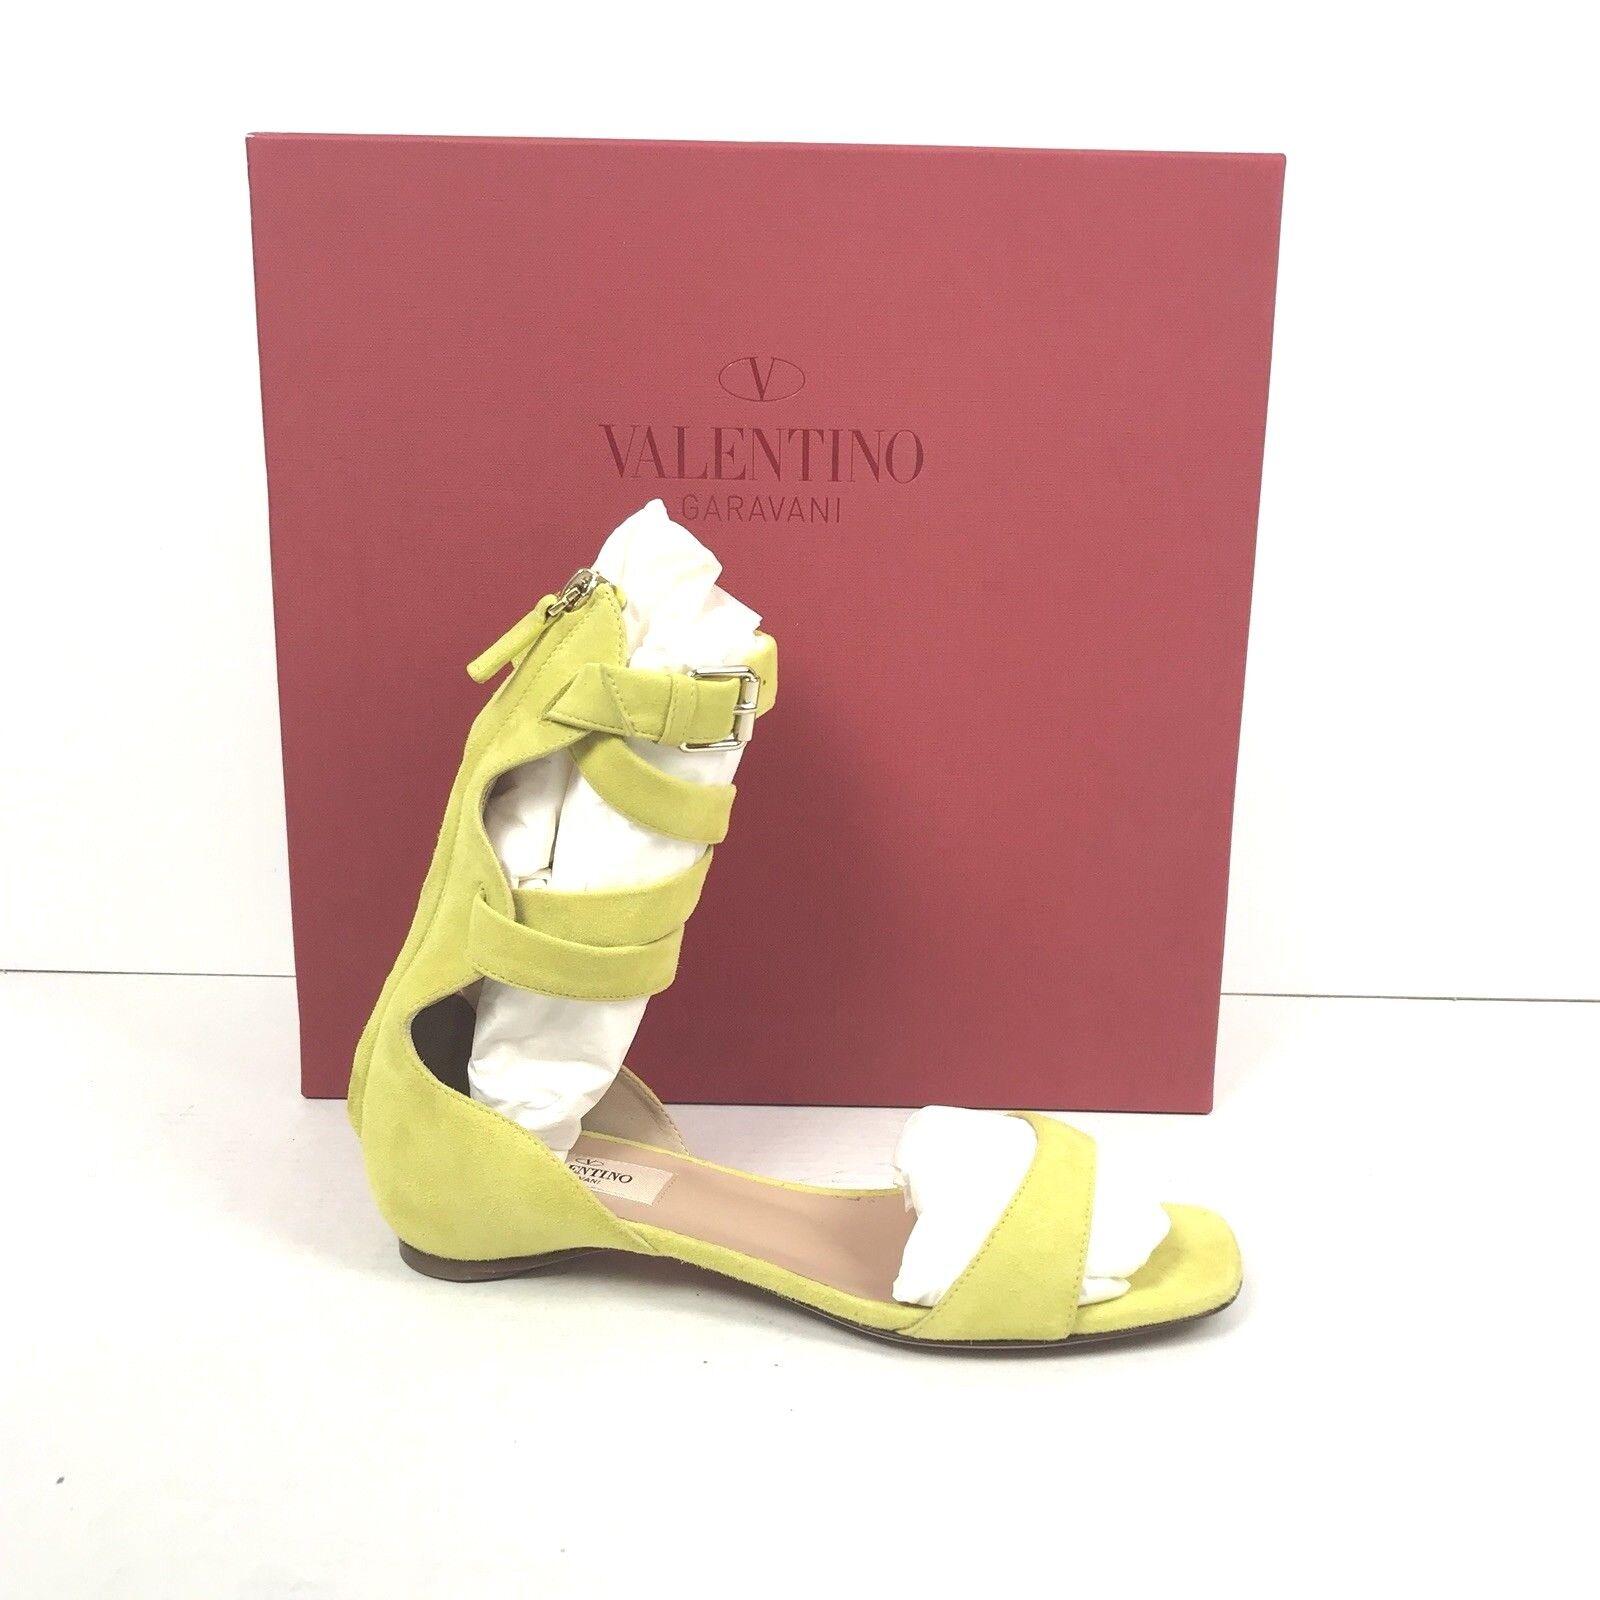 Auth Valentino Garavani Plum Ankle Wrap Flat Sandal SZ 36.5 36.5 36.5 Green Suede  795 64bda4